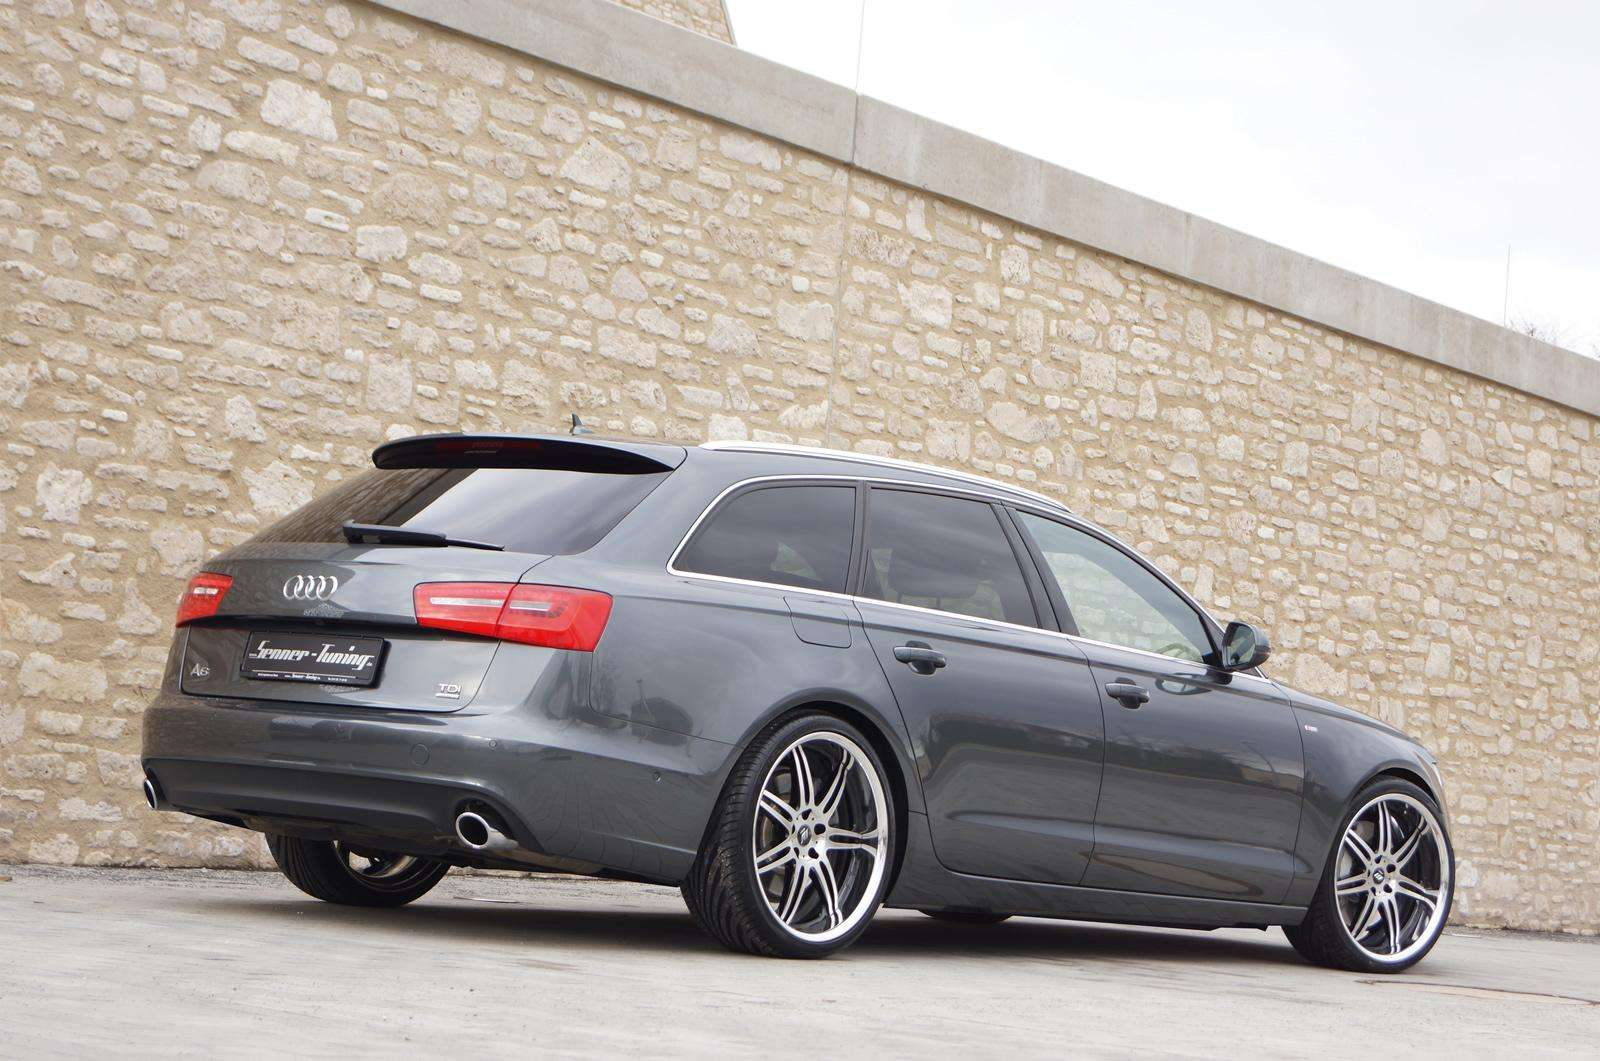 Audi A6 Avant 3.0 TDI Senner Tuning